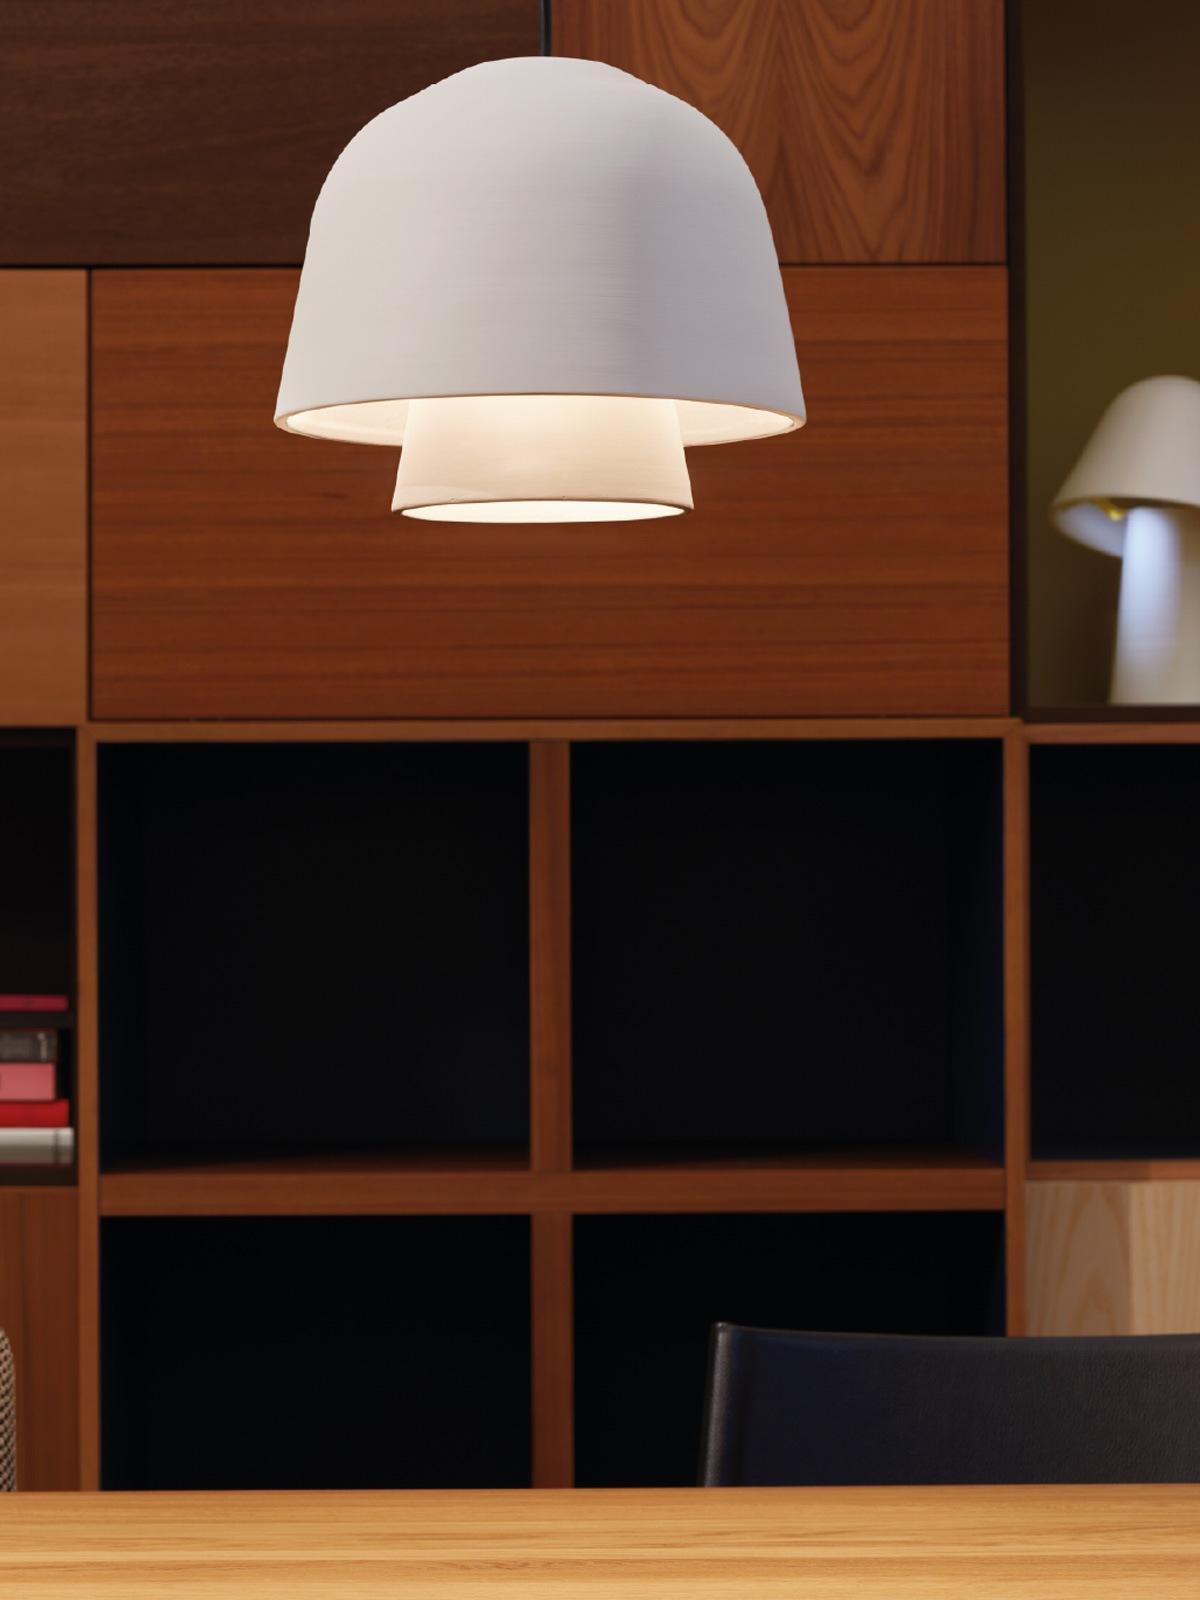 Okina 30 Pott Keramikleuchte Designort Lampen Berlin Onlineshop